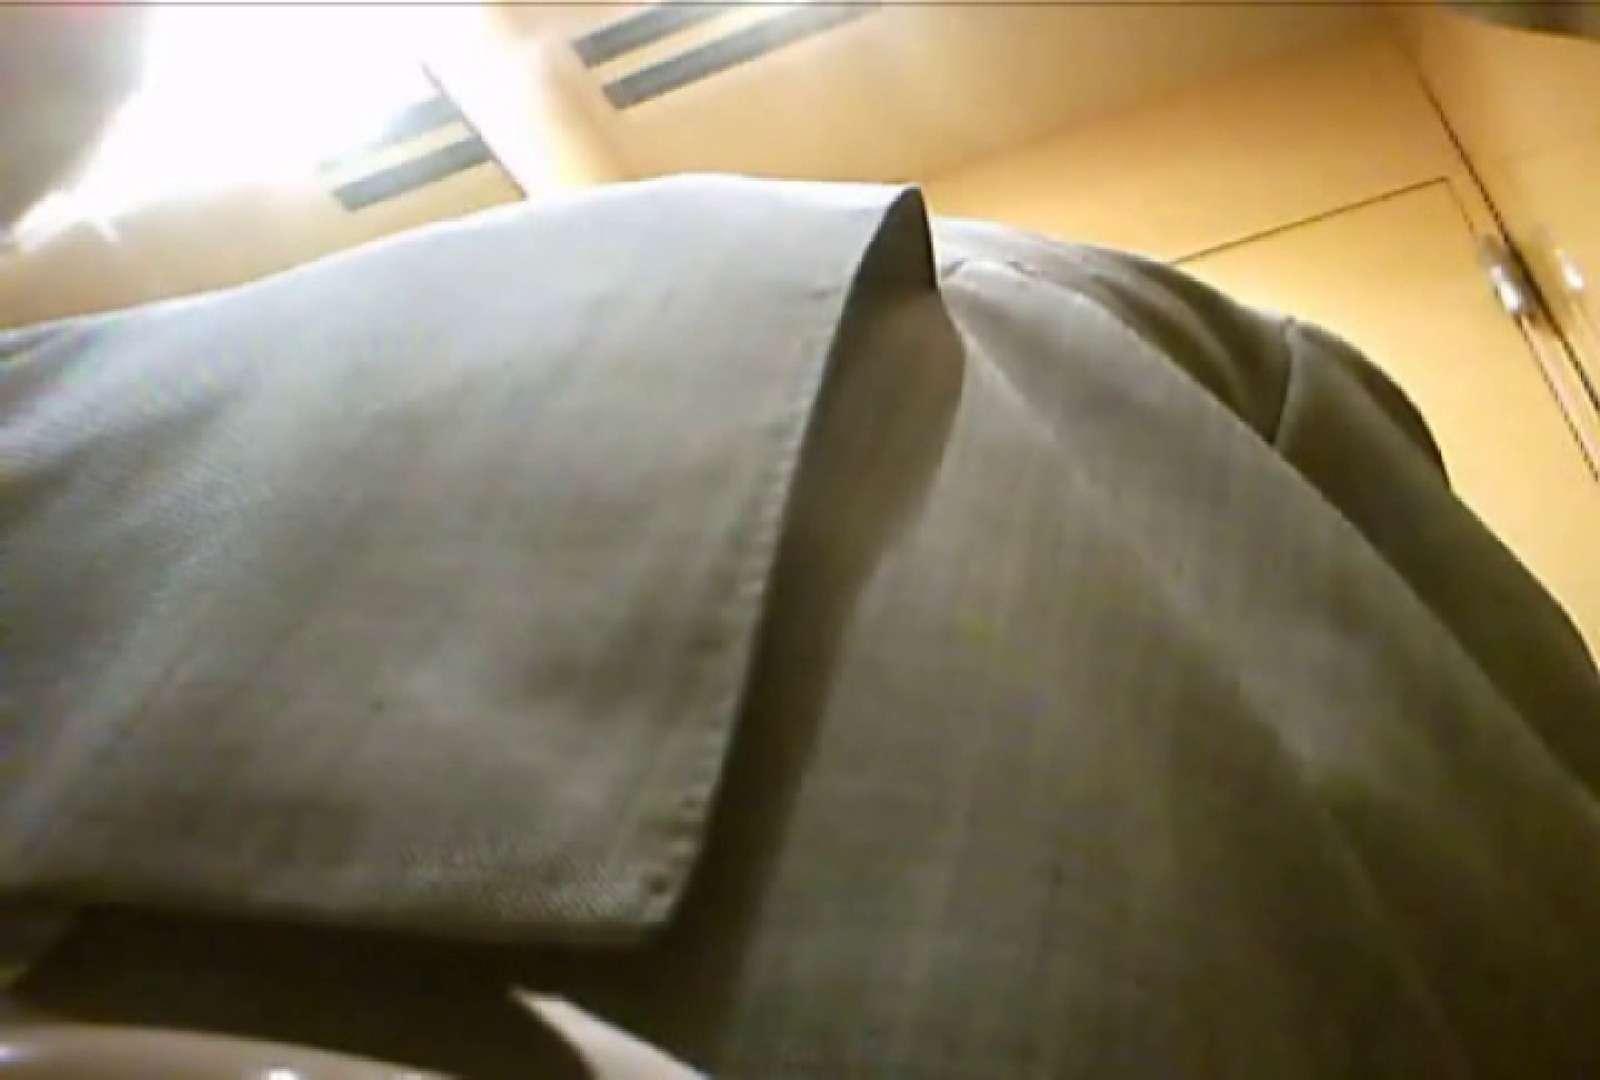 SEASON 2ND!掴み取りさんの洗面所覗き!in新幹線!VOL.02 スーツボーイズ | ノンケボーイズ  82pic 23